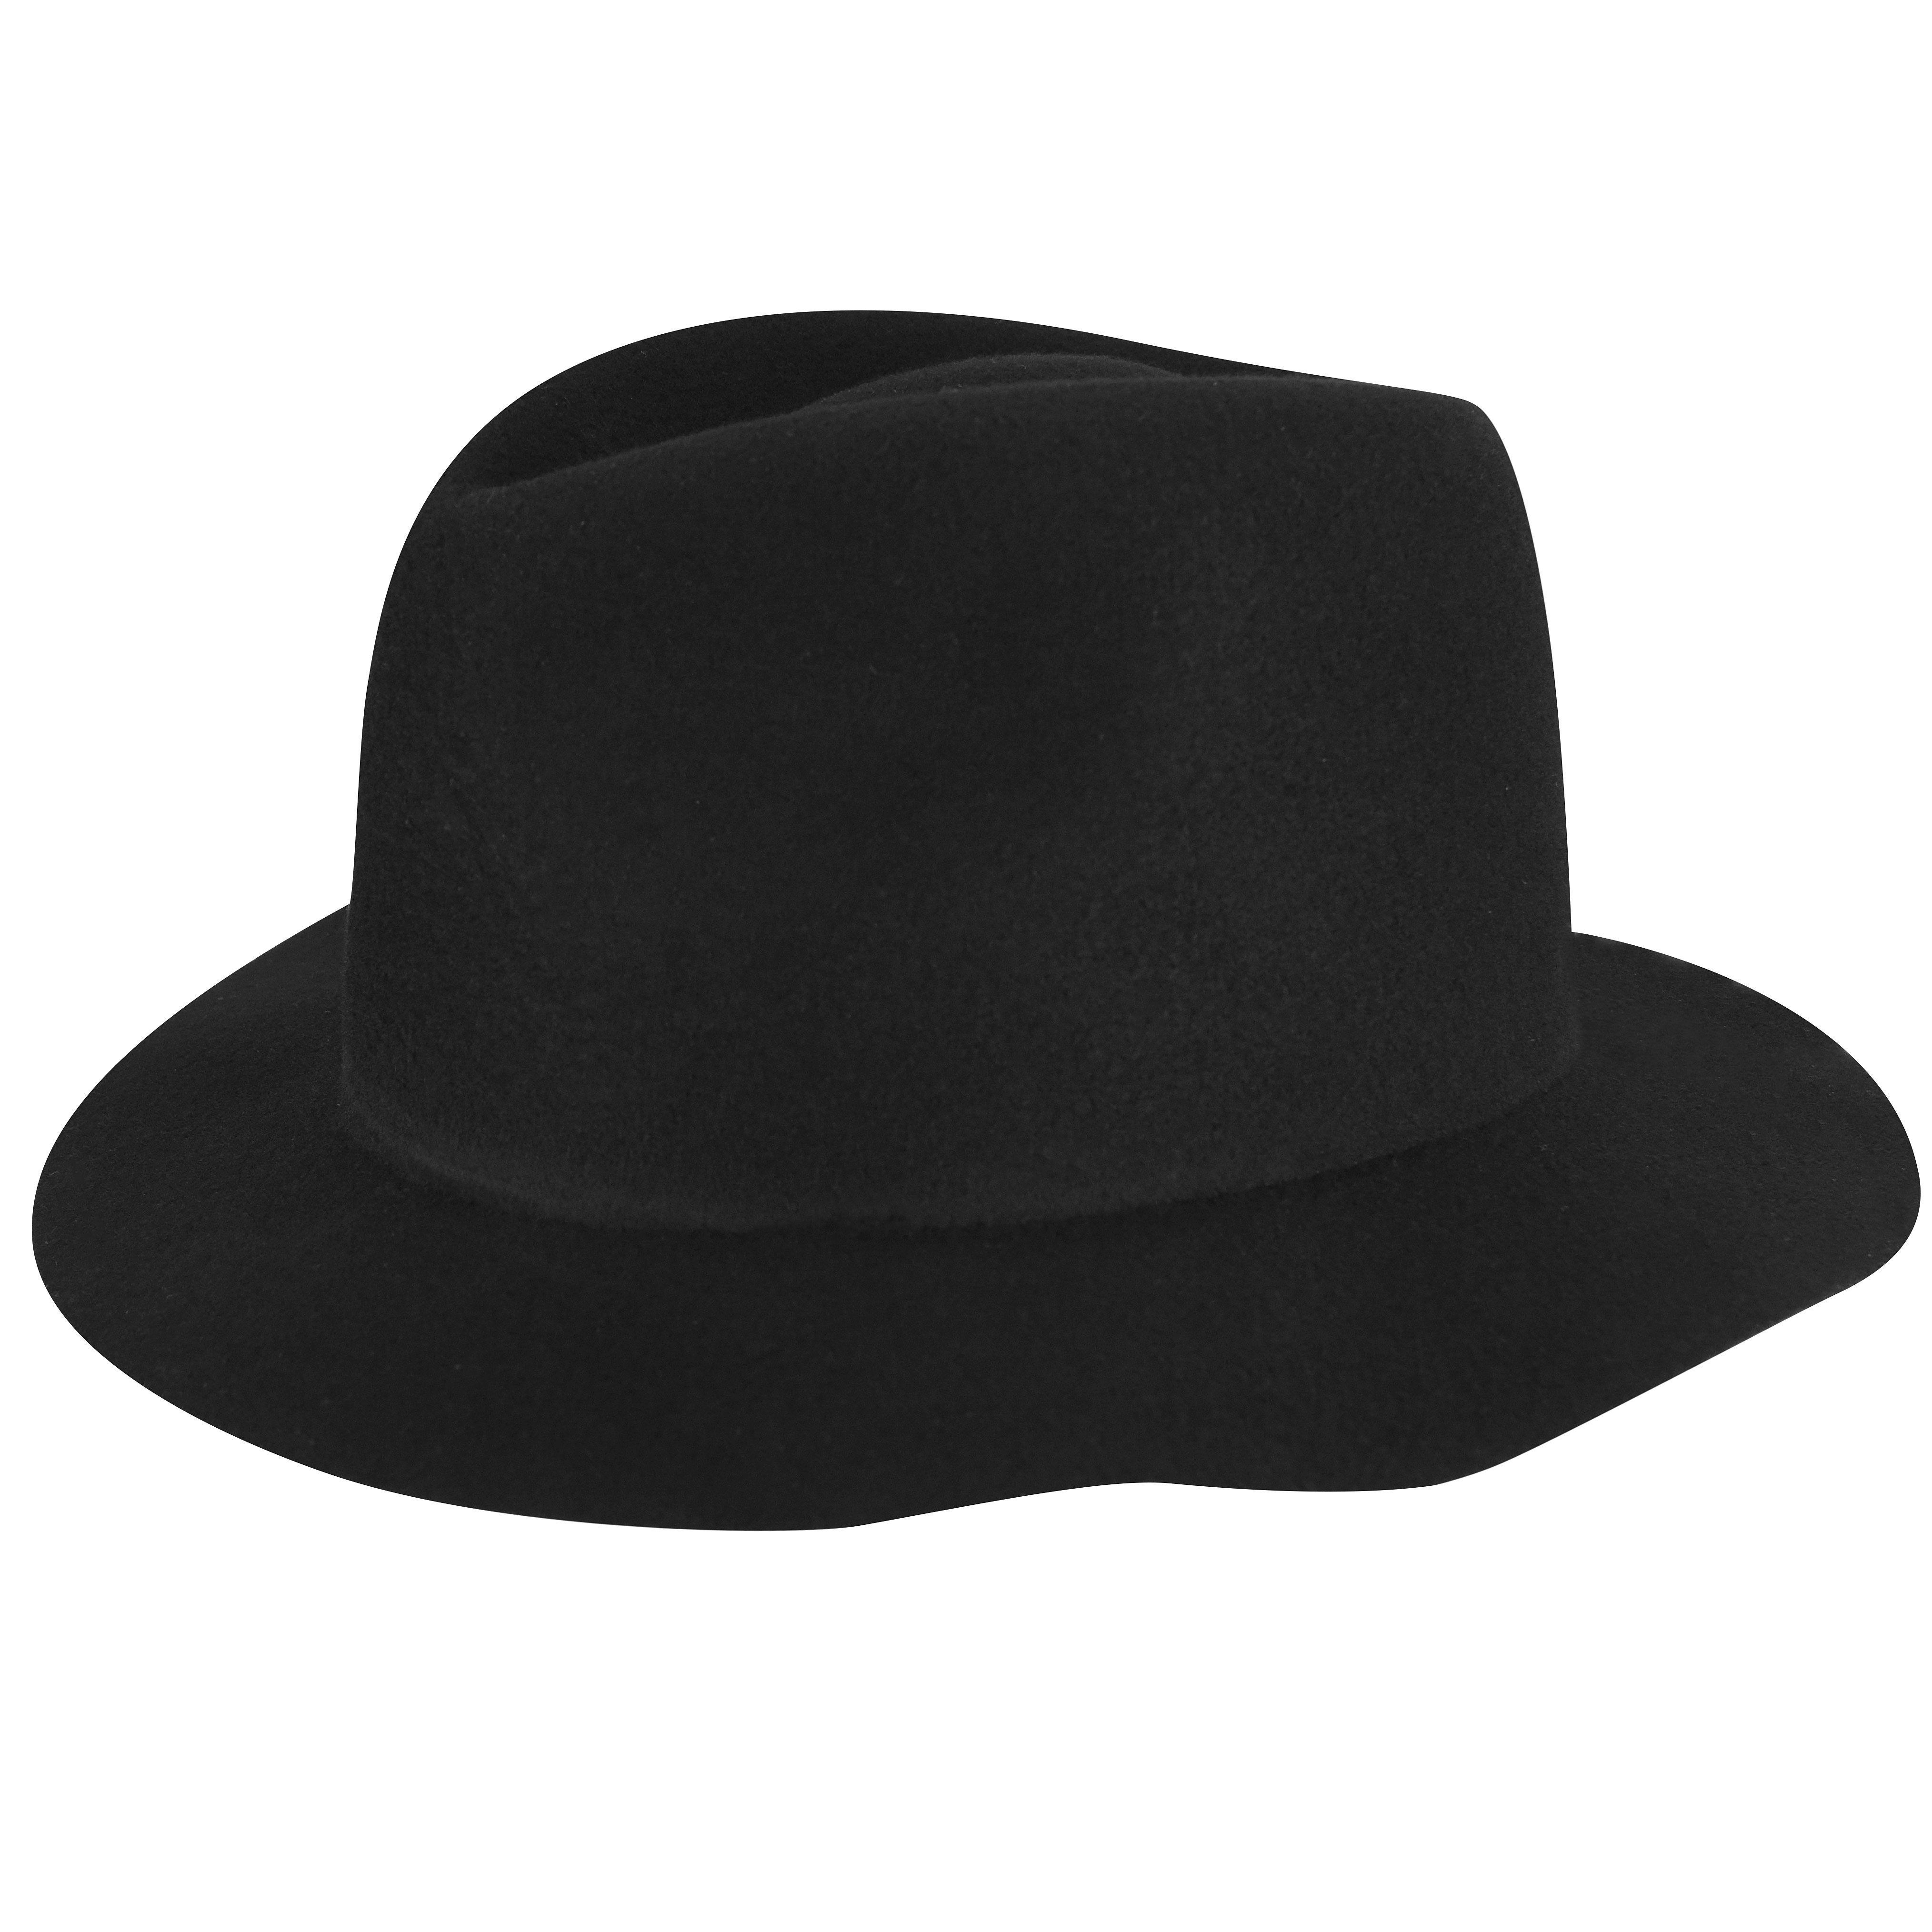 936249fcaf2db Bailey Hats Pierpont 70602BH. Details